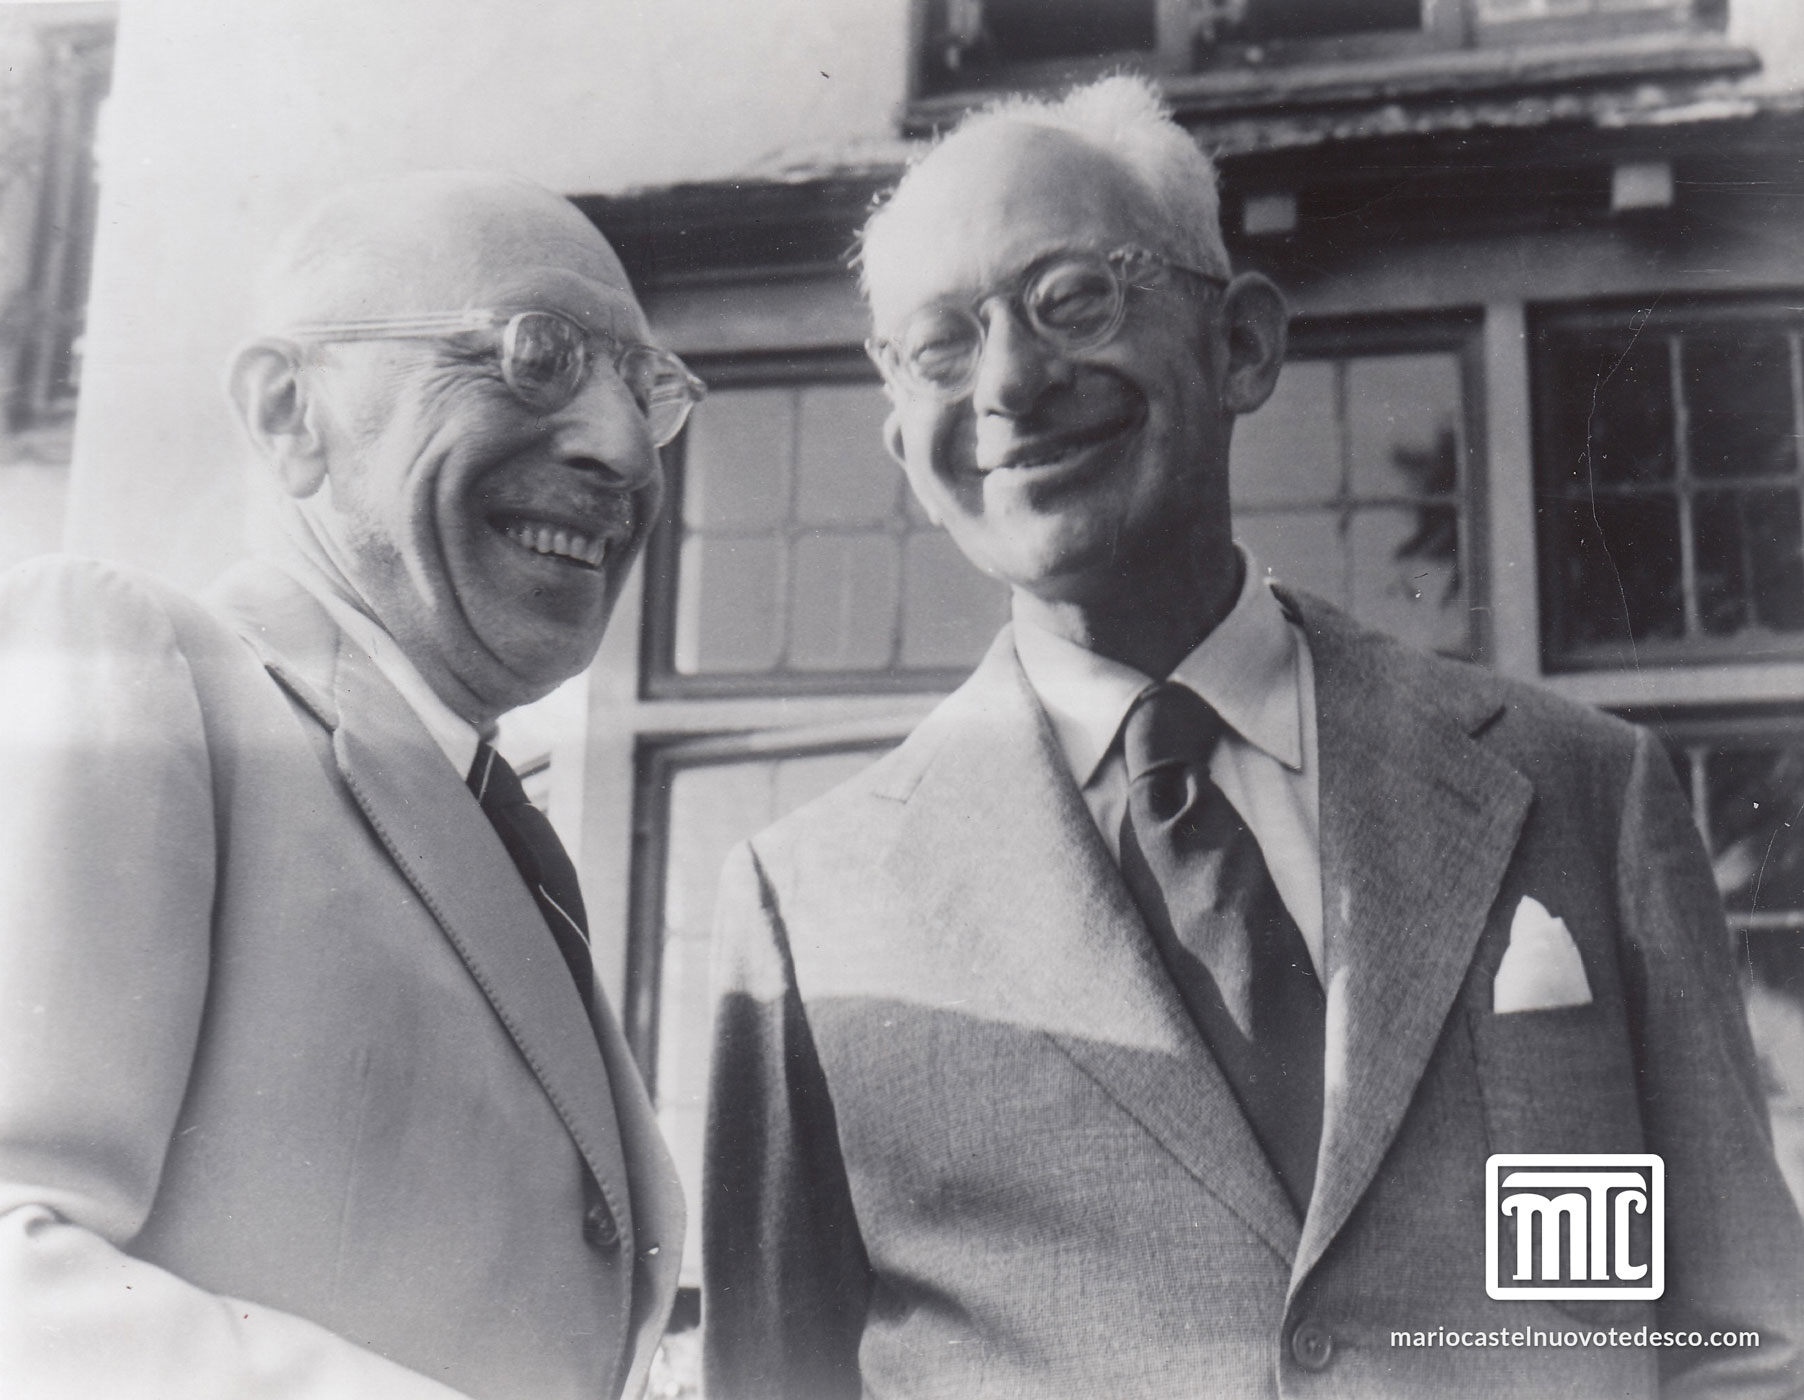 Igor Stravinsky, MCT, 1955